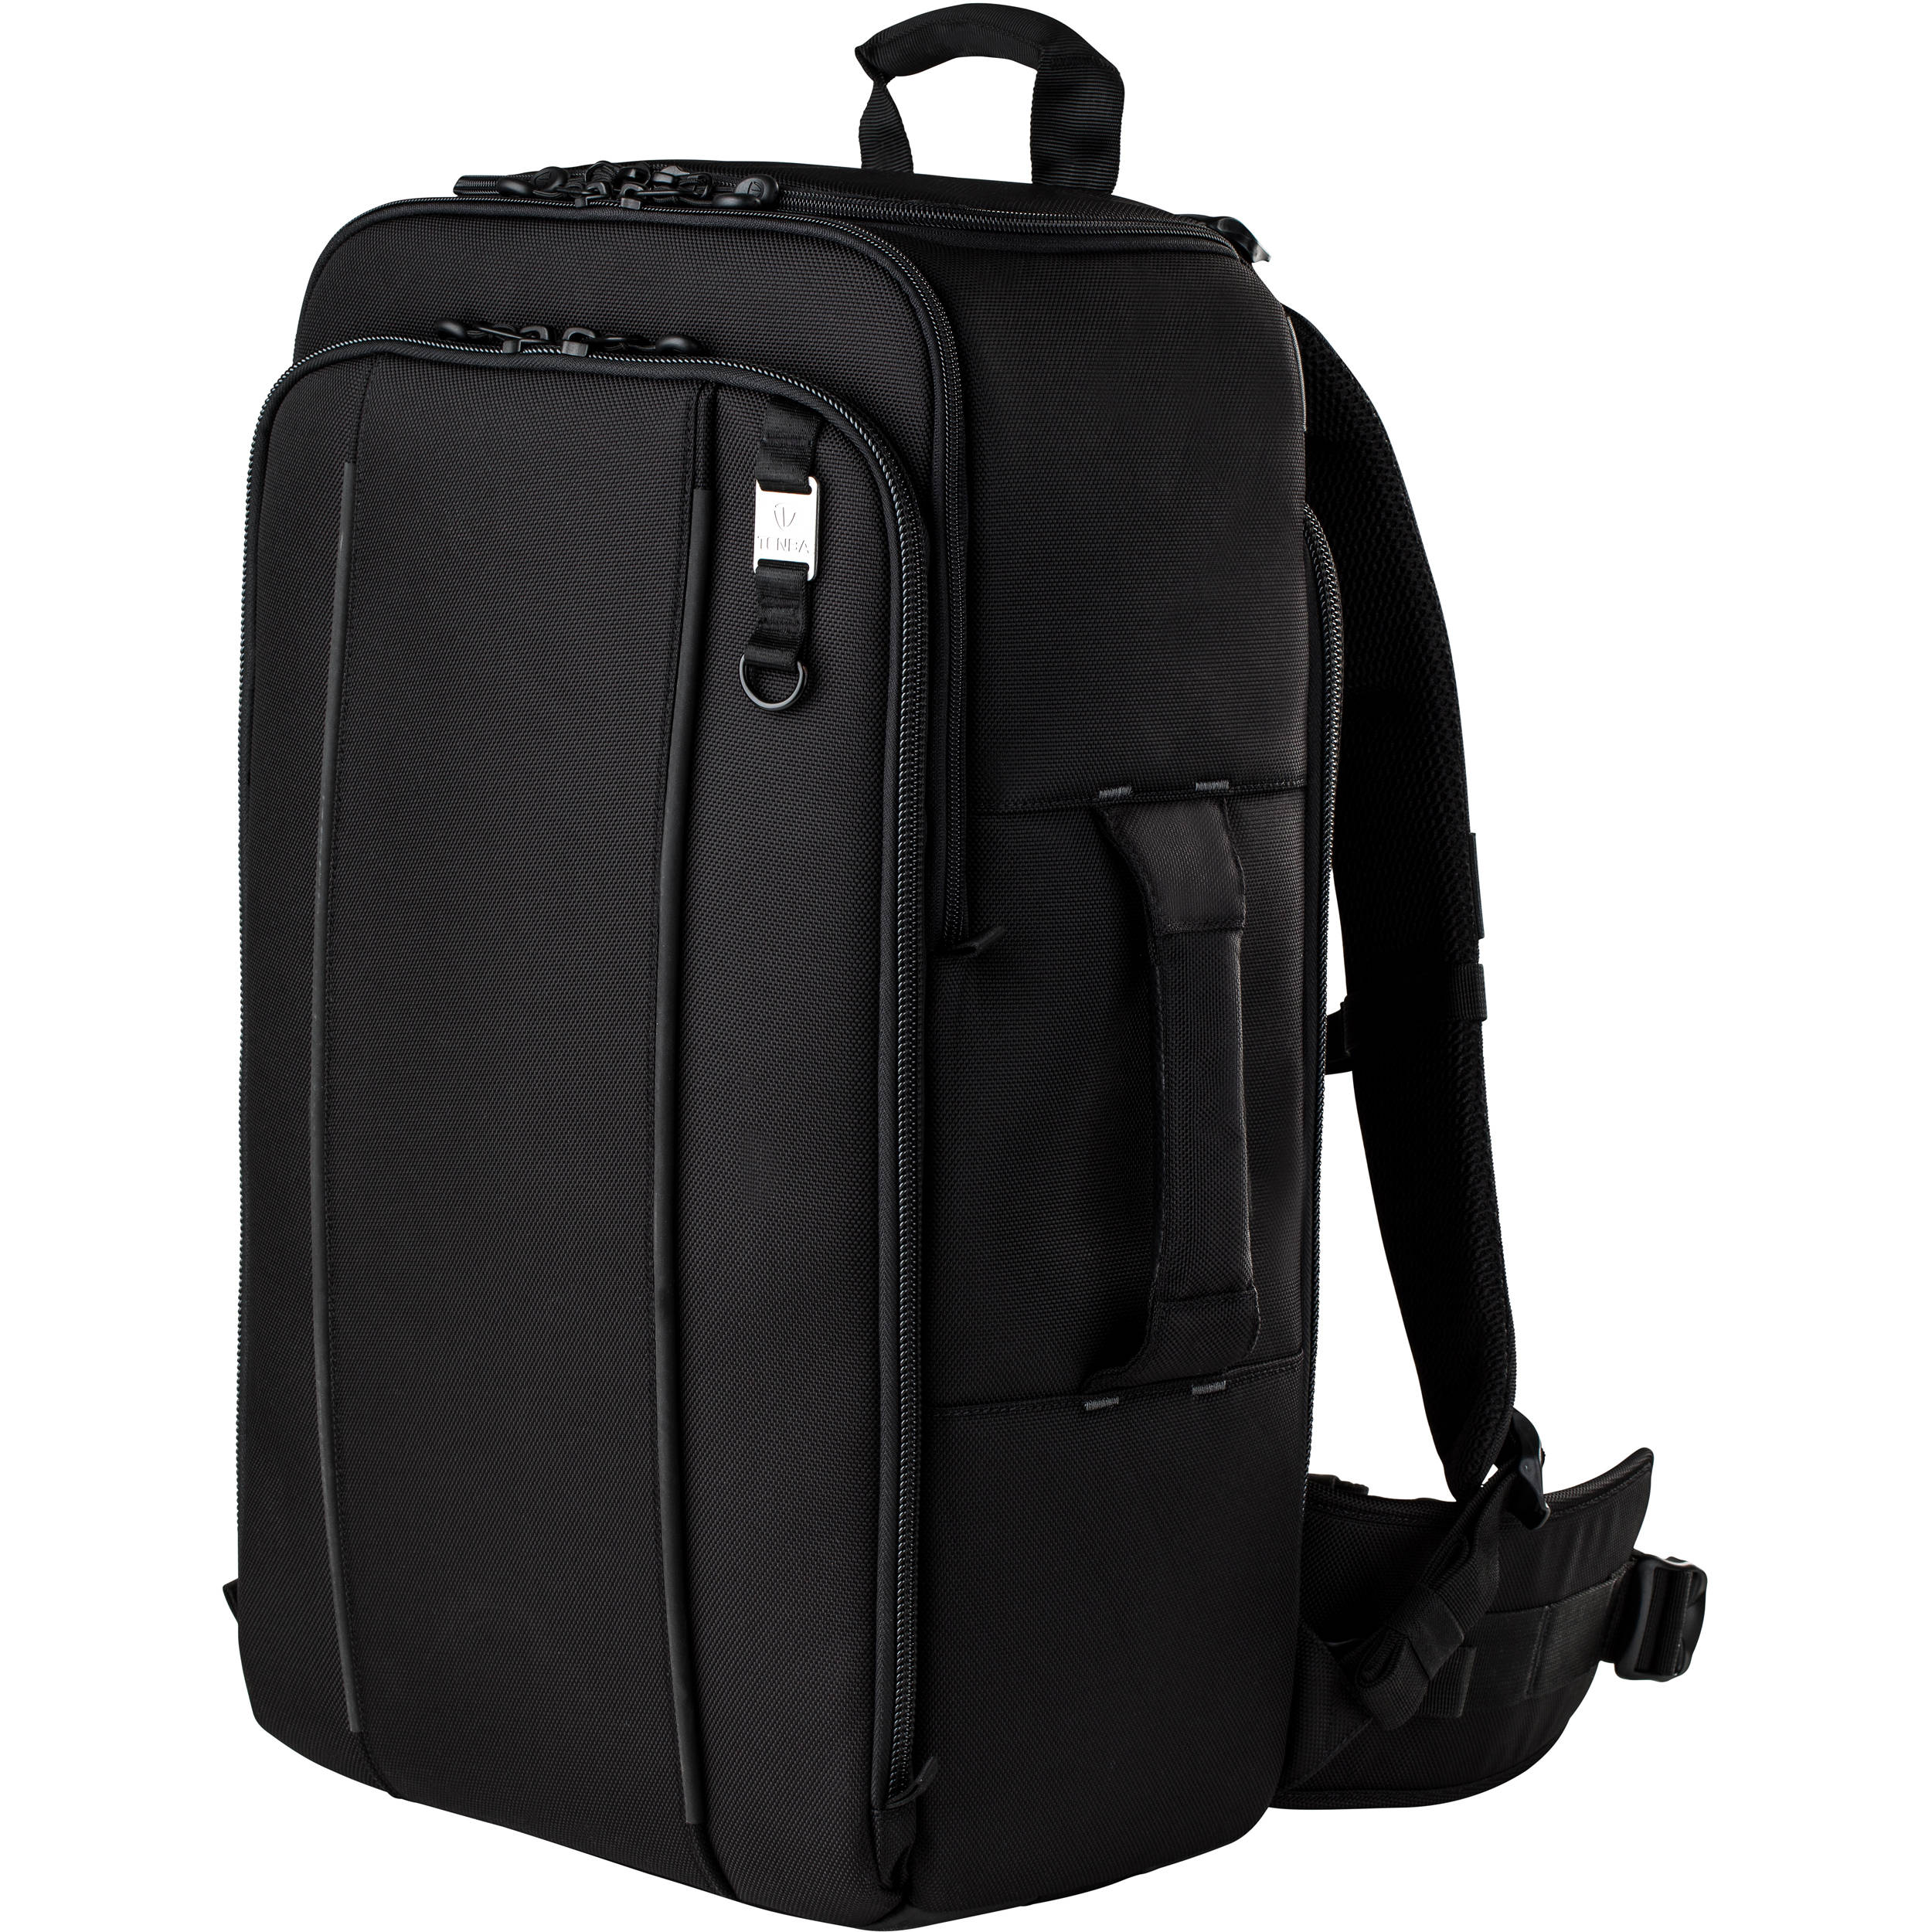 Tenba Roadie Backpack 22 Black 638 722 B Amp H Photo Video